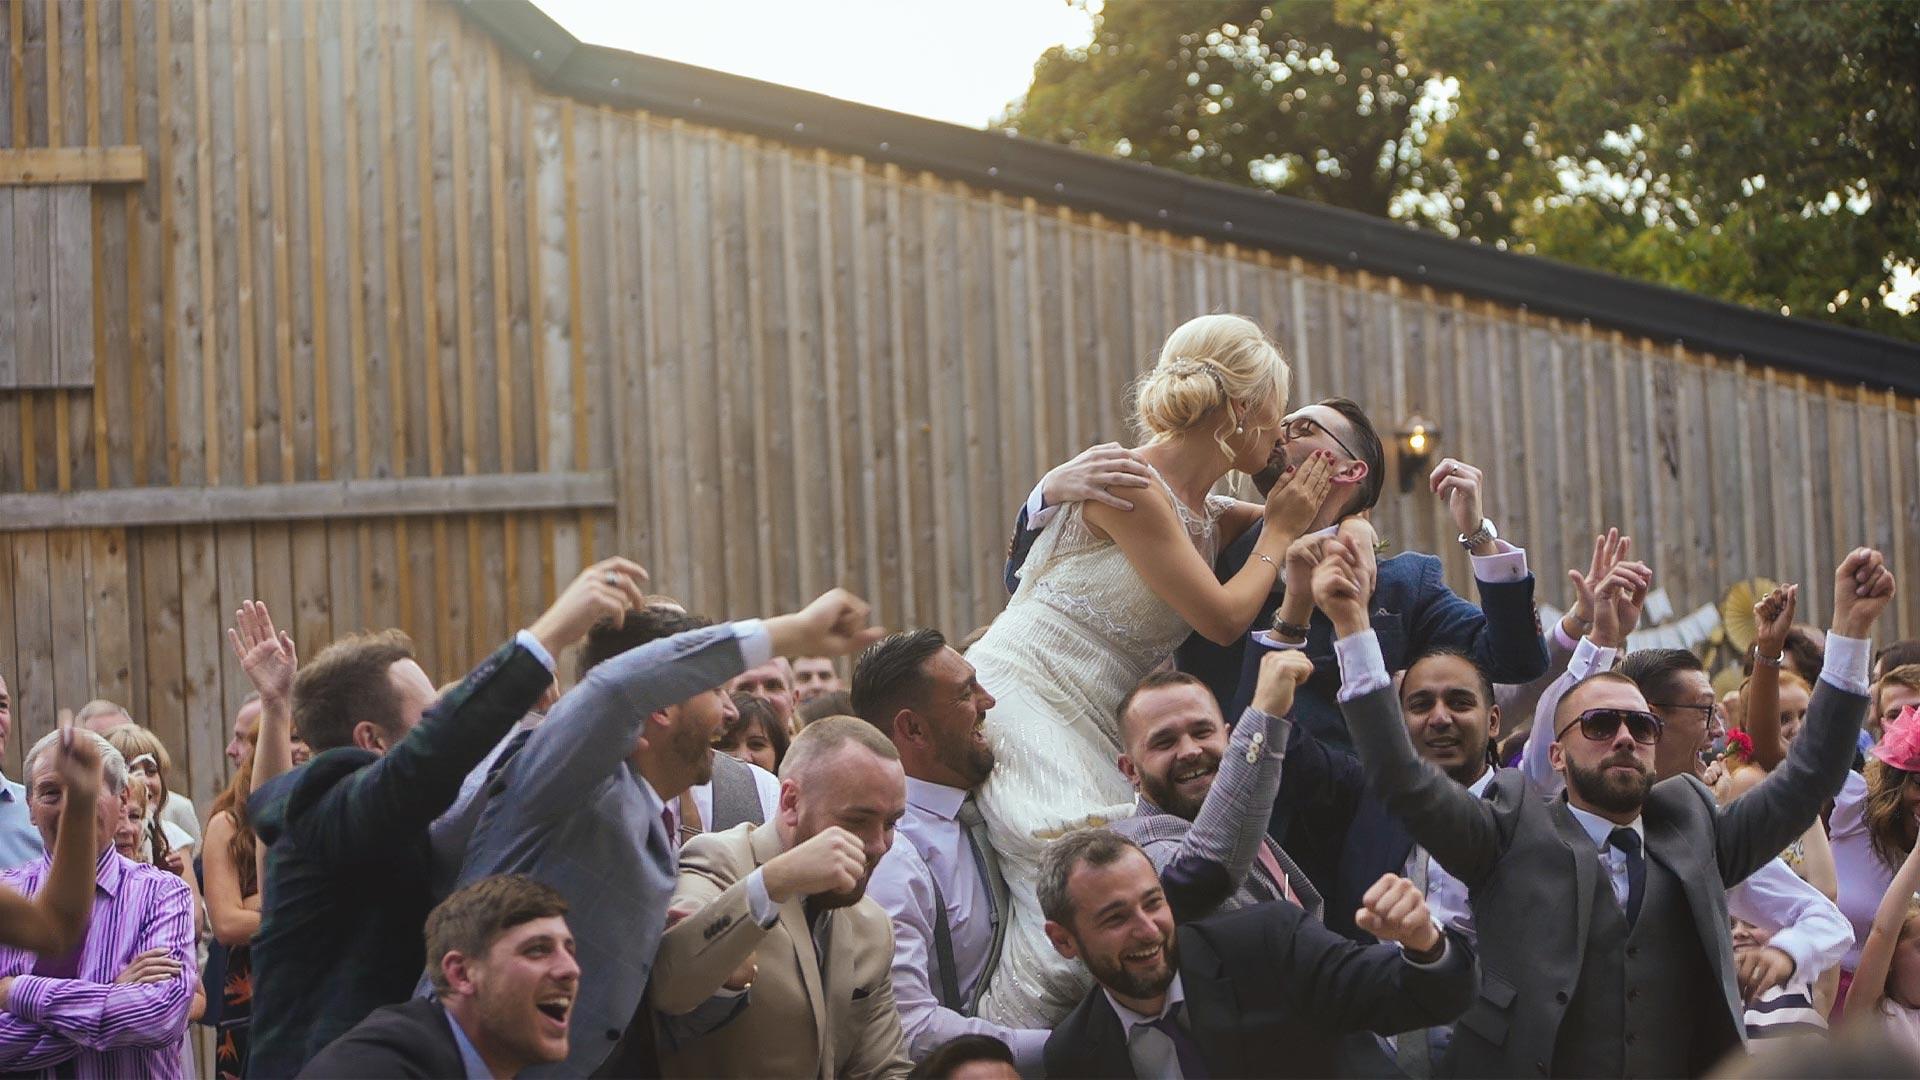 fun wedding crowd surfing couple